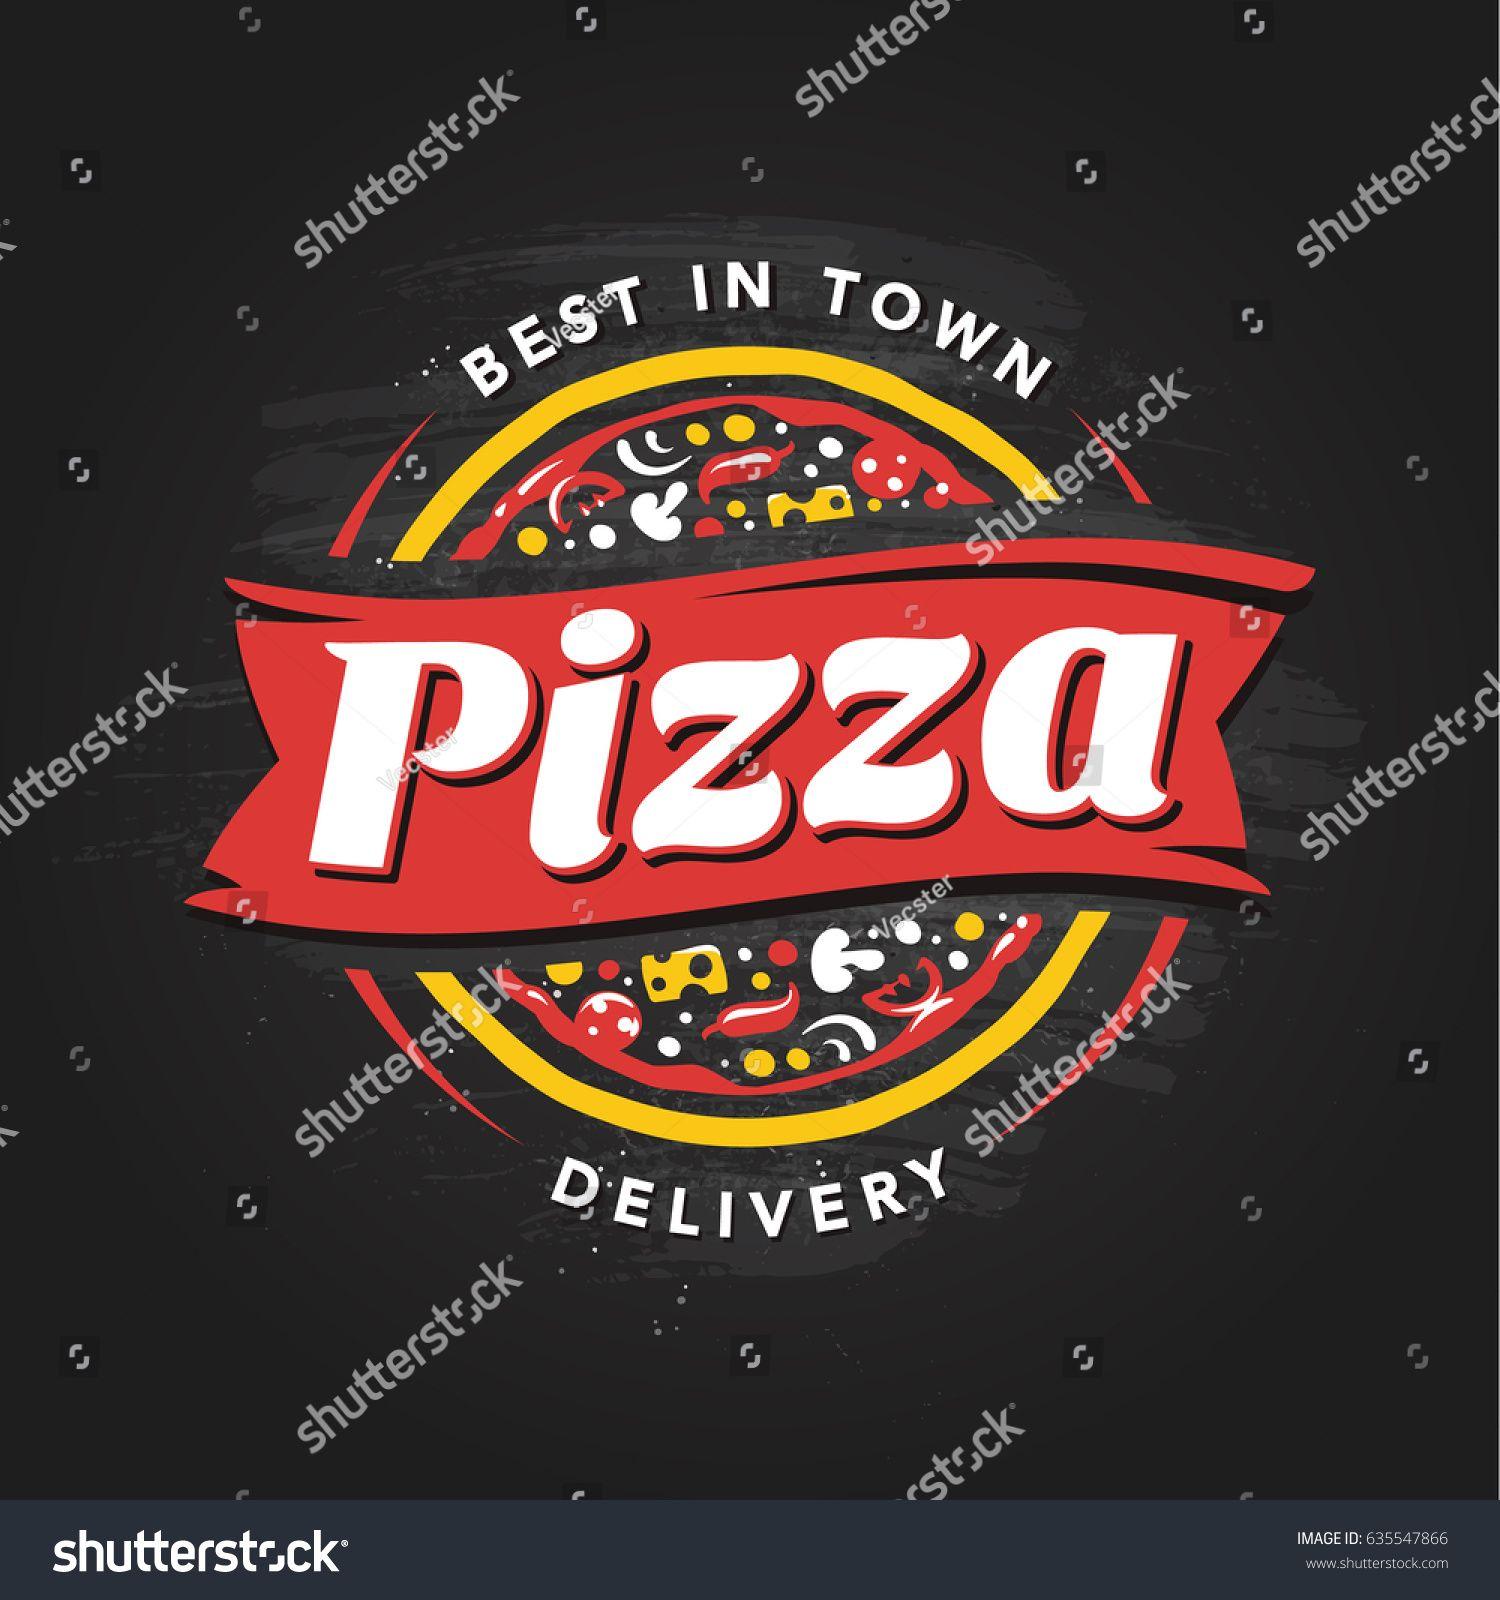 Pizzeria Vector Emblem on blackboard. Pizza logo template